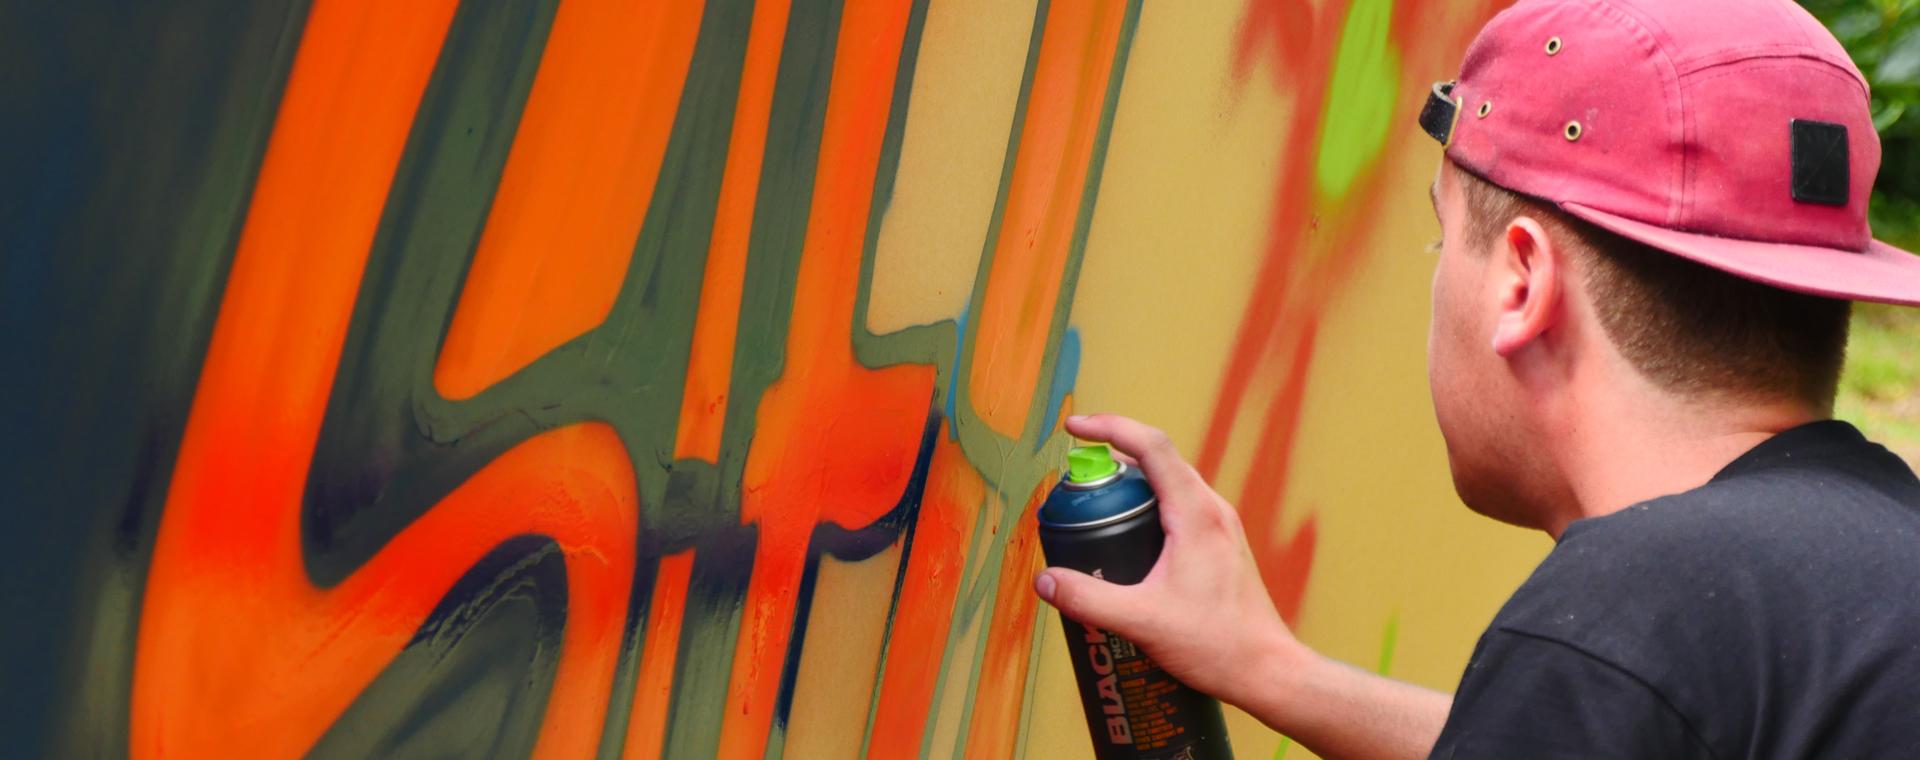 graffiti sander